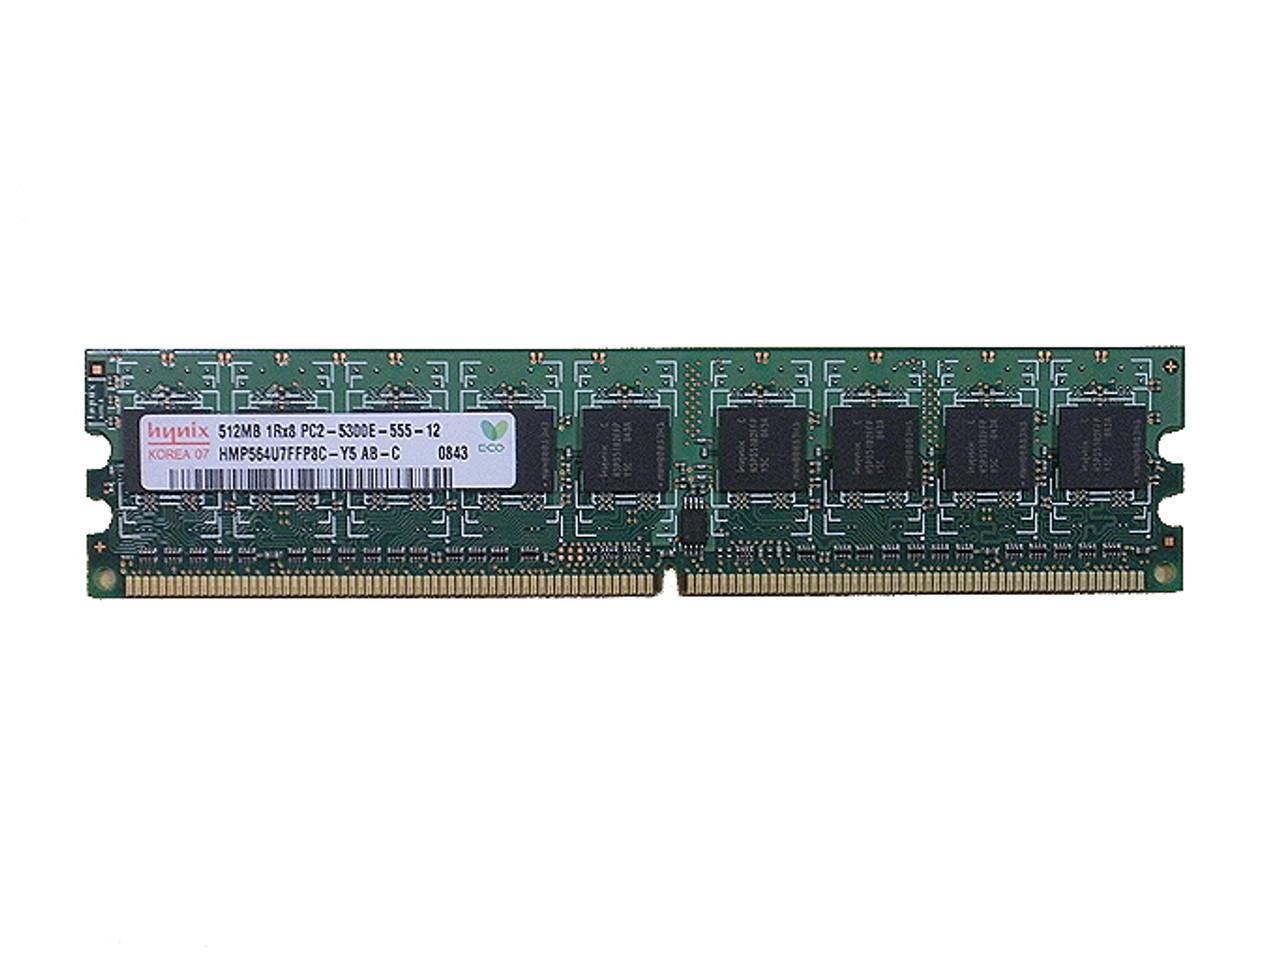 Dell PowerEdge 840 Memory (RAM)